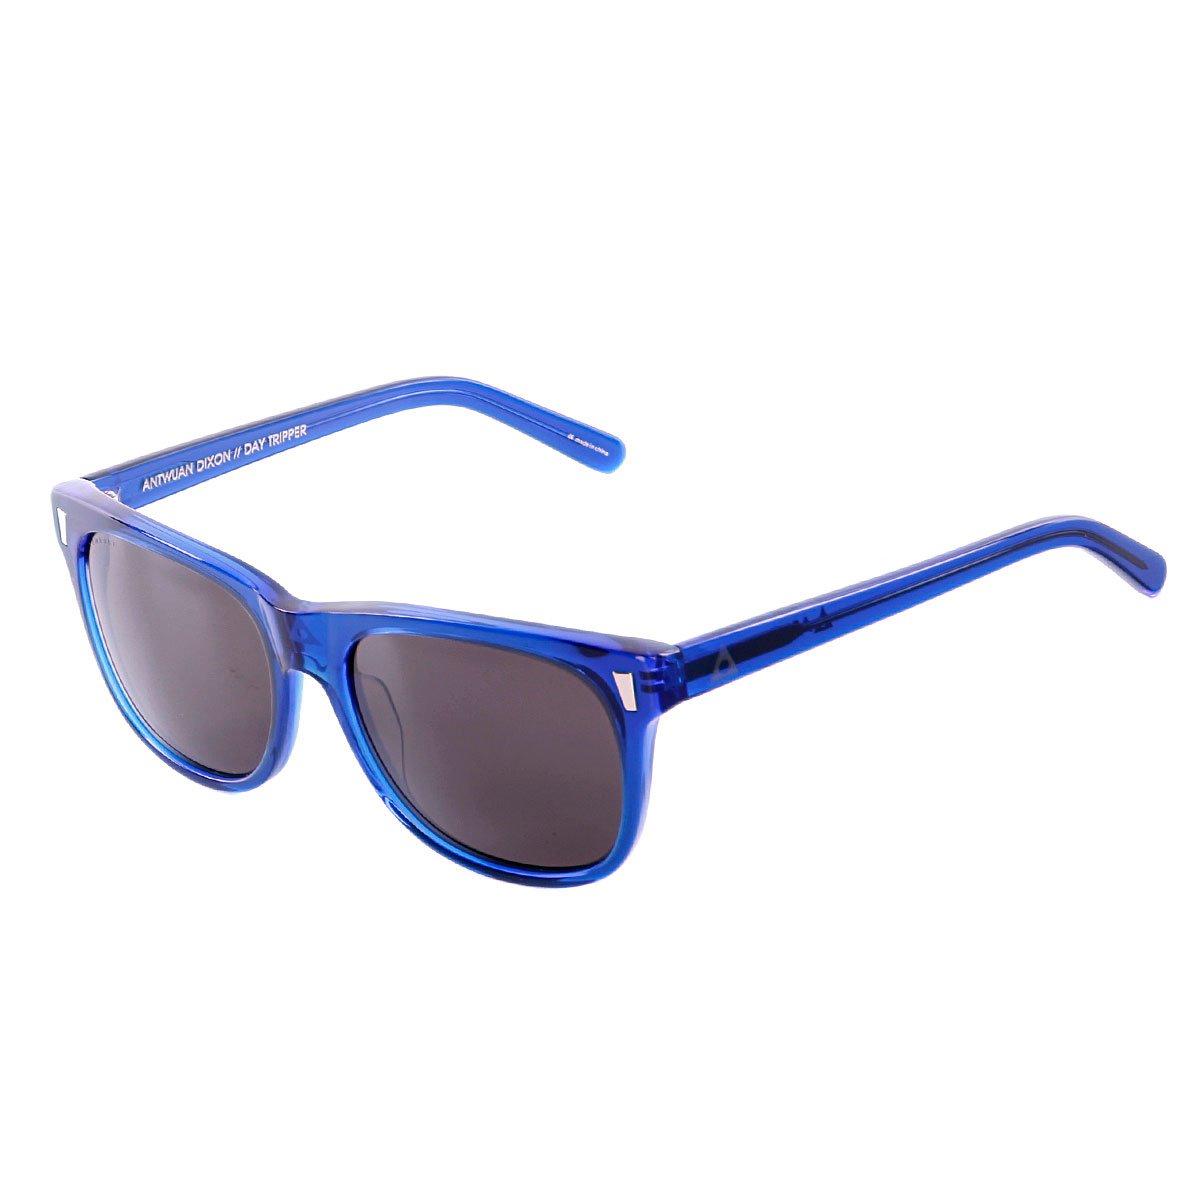 3ed394ceca Купить очки Ashbury Day Tripper Antwuan Dixon Blue в интернет ...